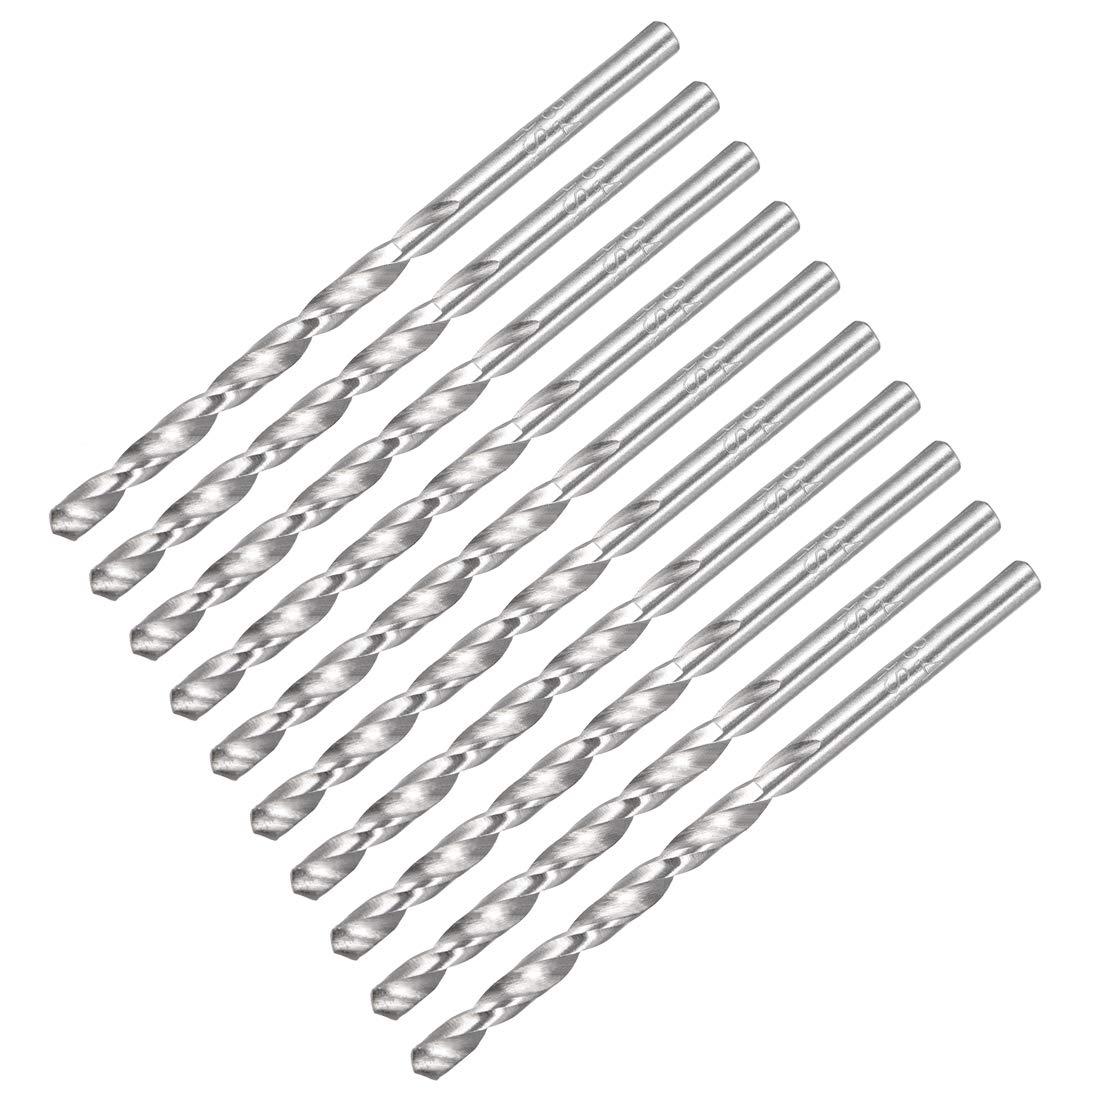 uxcell 1.6mm Twist Drill High Speed Steel Bit HSS-4241 for Steel,Aluminum Alloy 10pcs